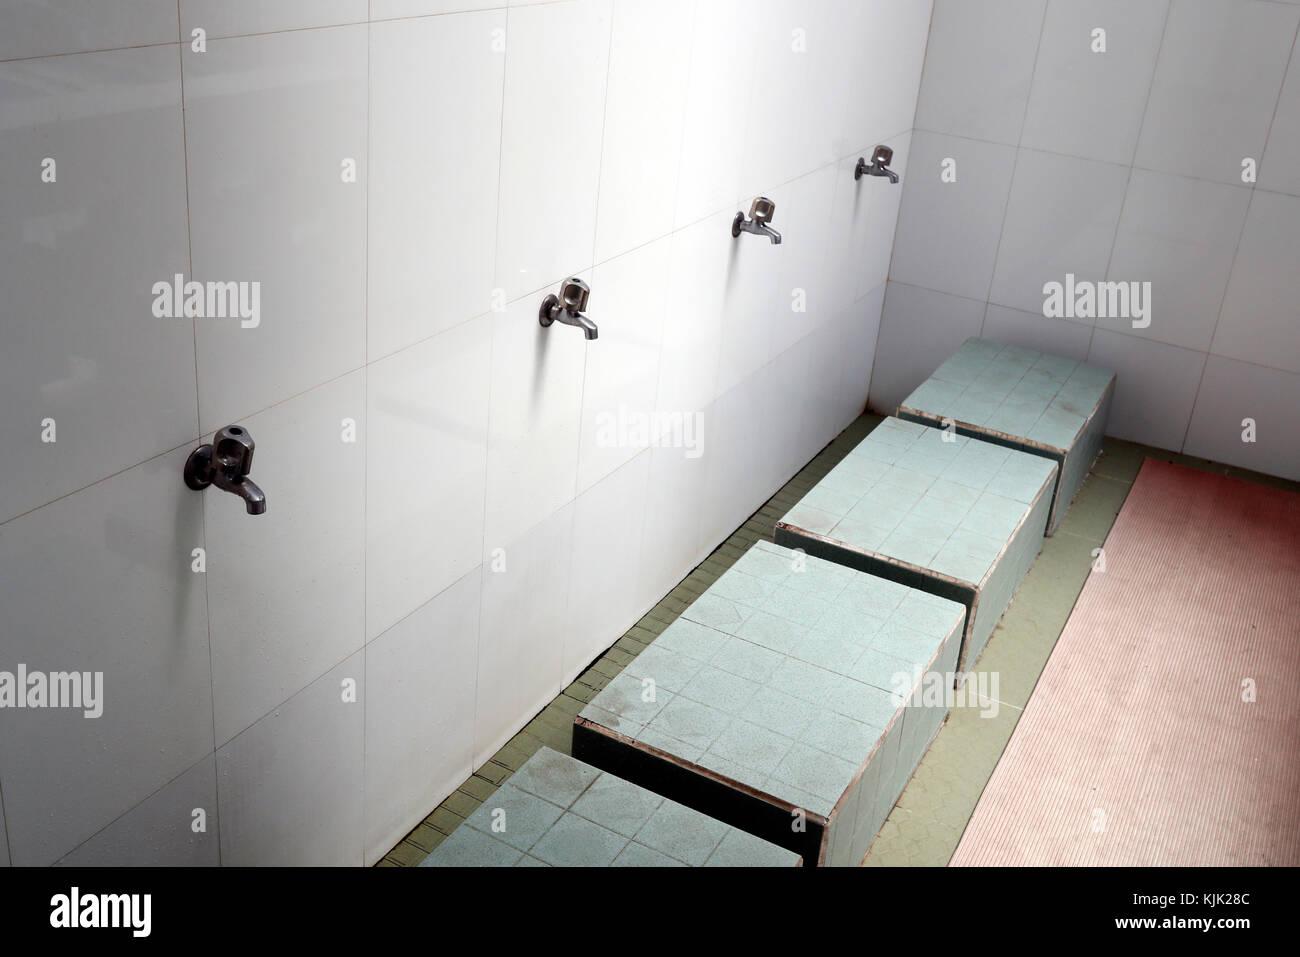 Wudu Stock Photos & Wudu Stock Images - Alamy